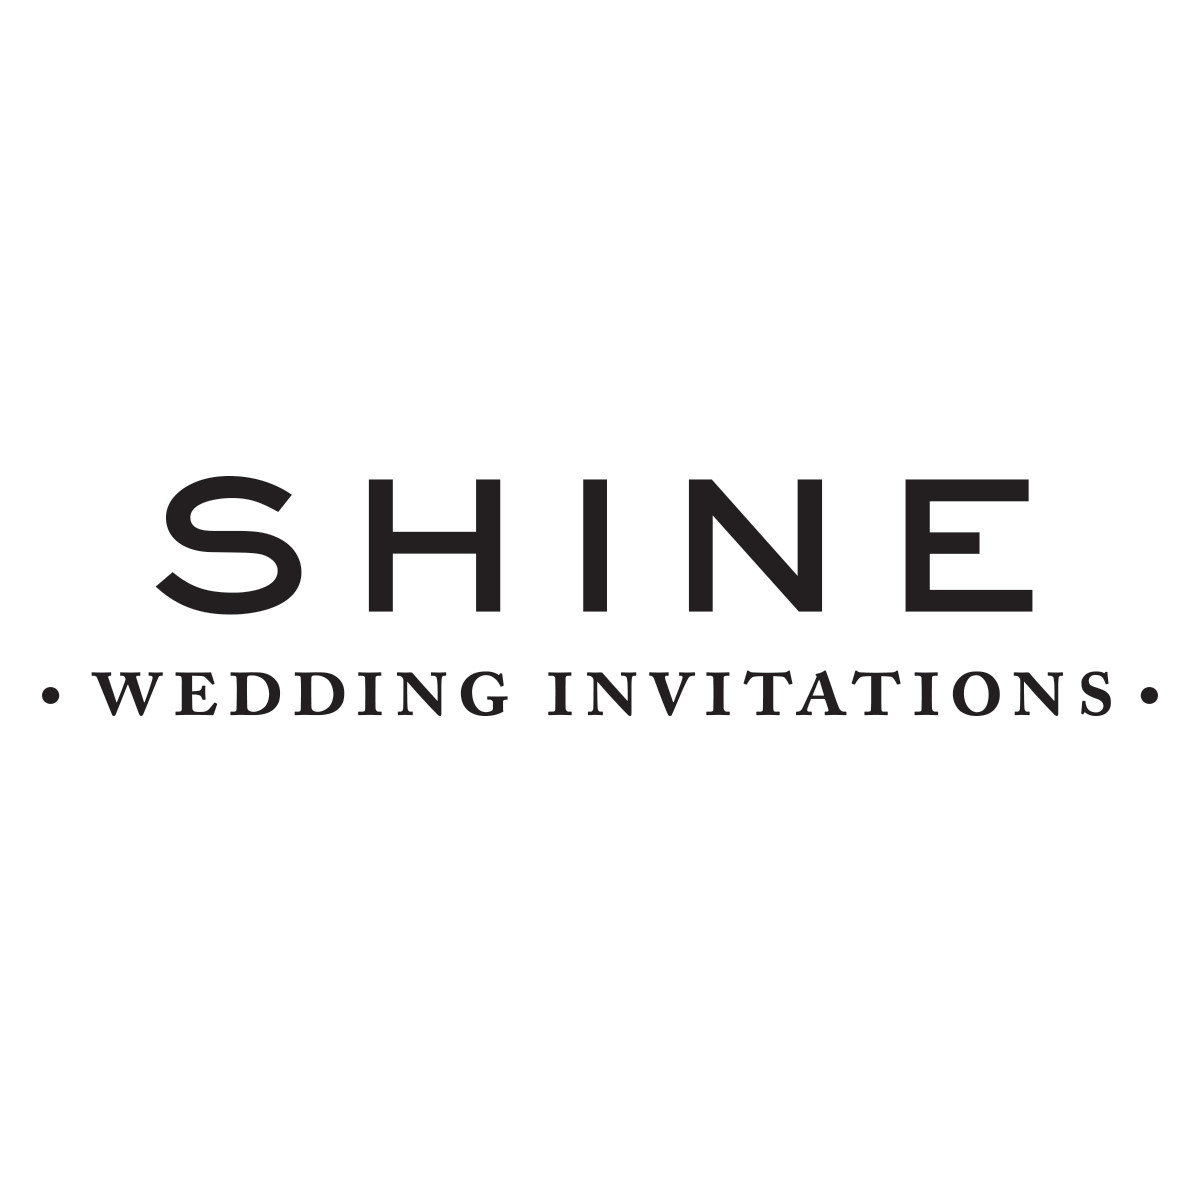 Shine Wedding Invitations Reviews - 212 Reviews - Page 3